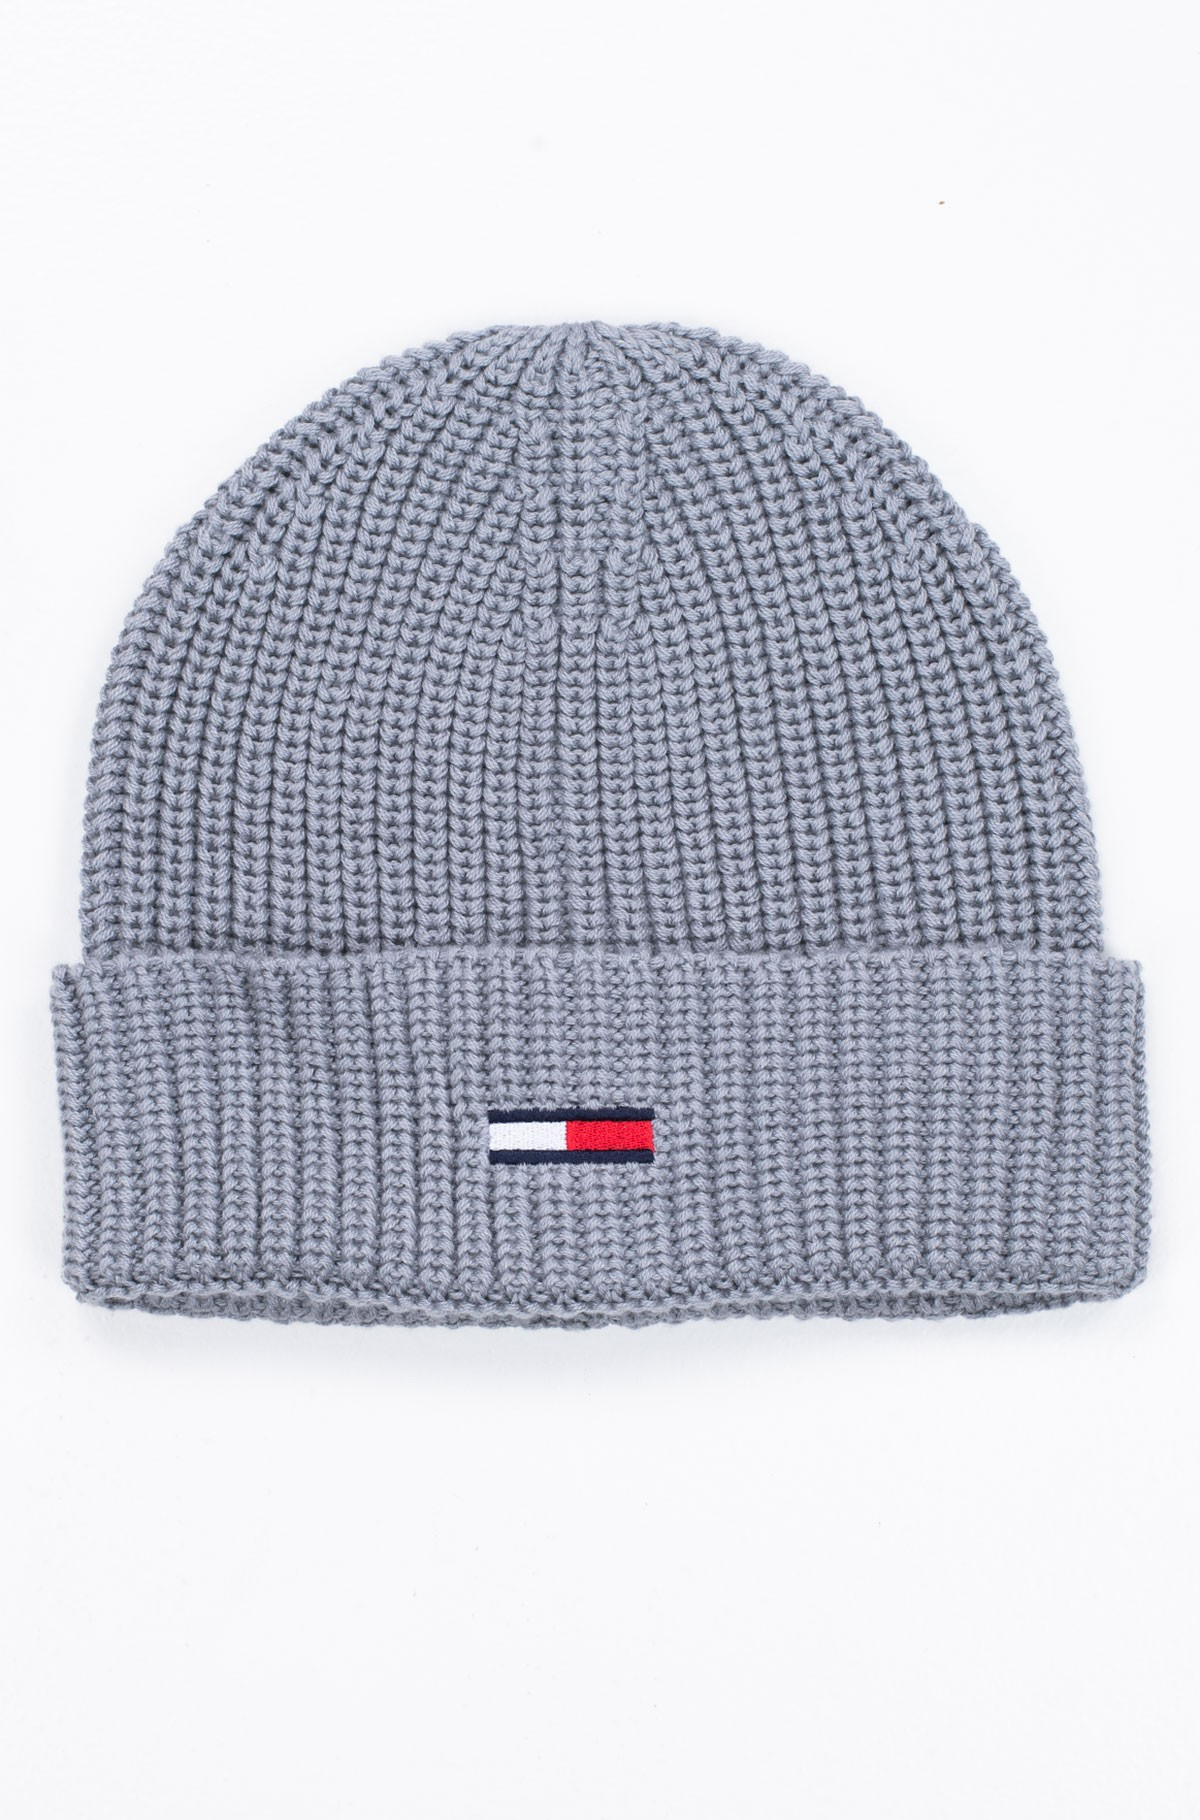 Kepurės ir šaliko komplektas TJM BASIC RIB SCARF & BEANIE GP-full-2